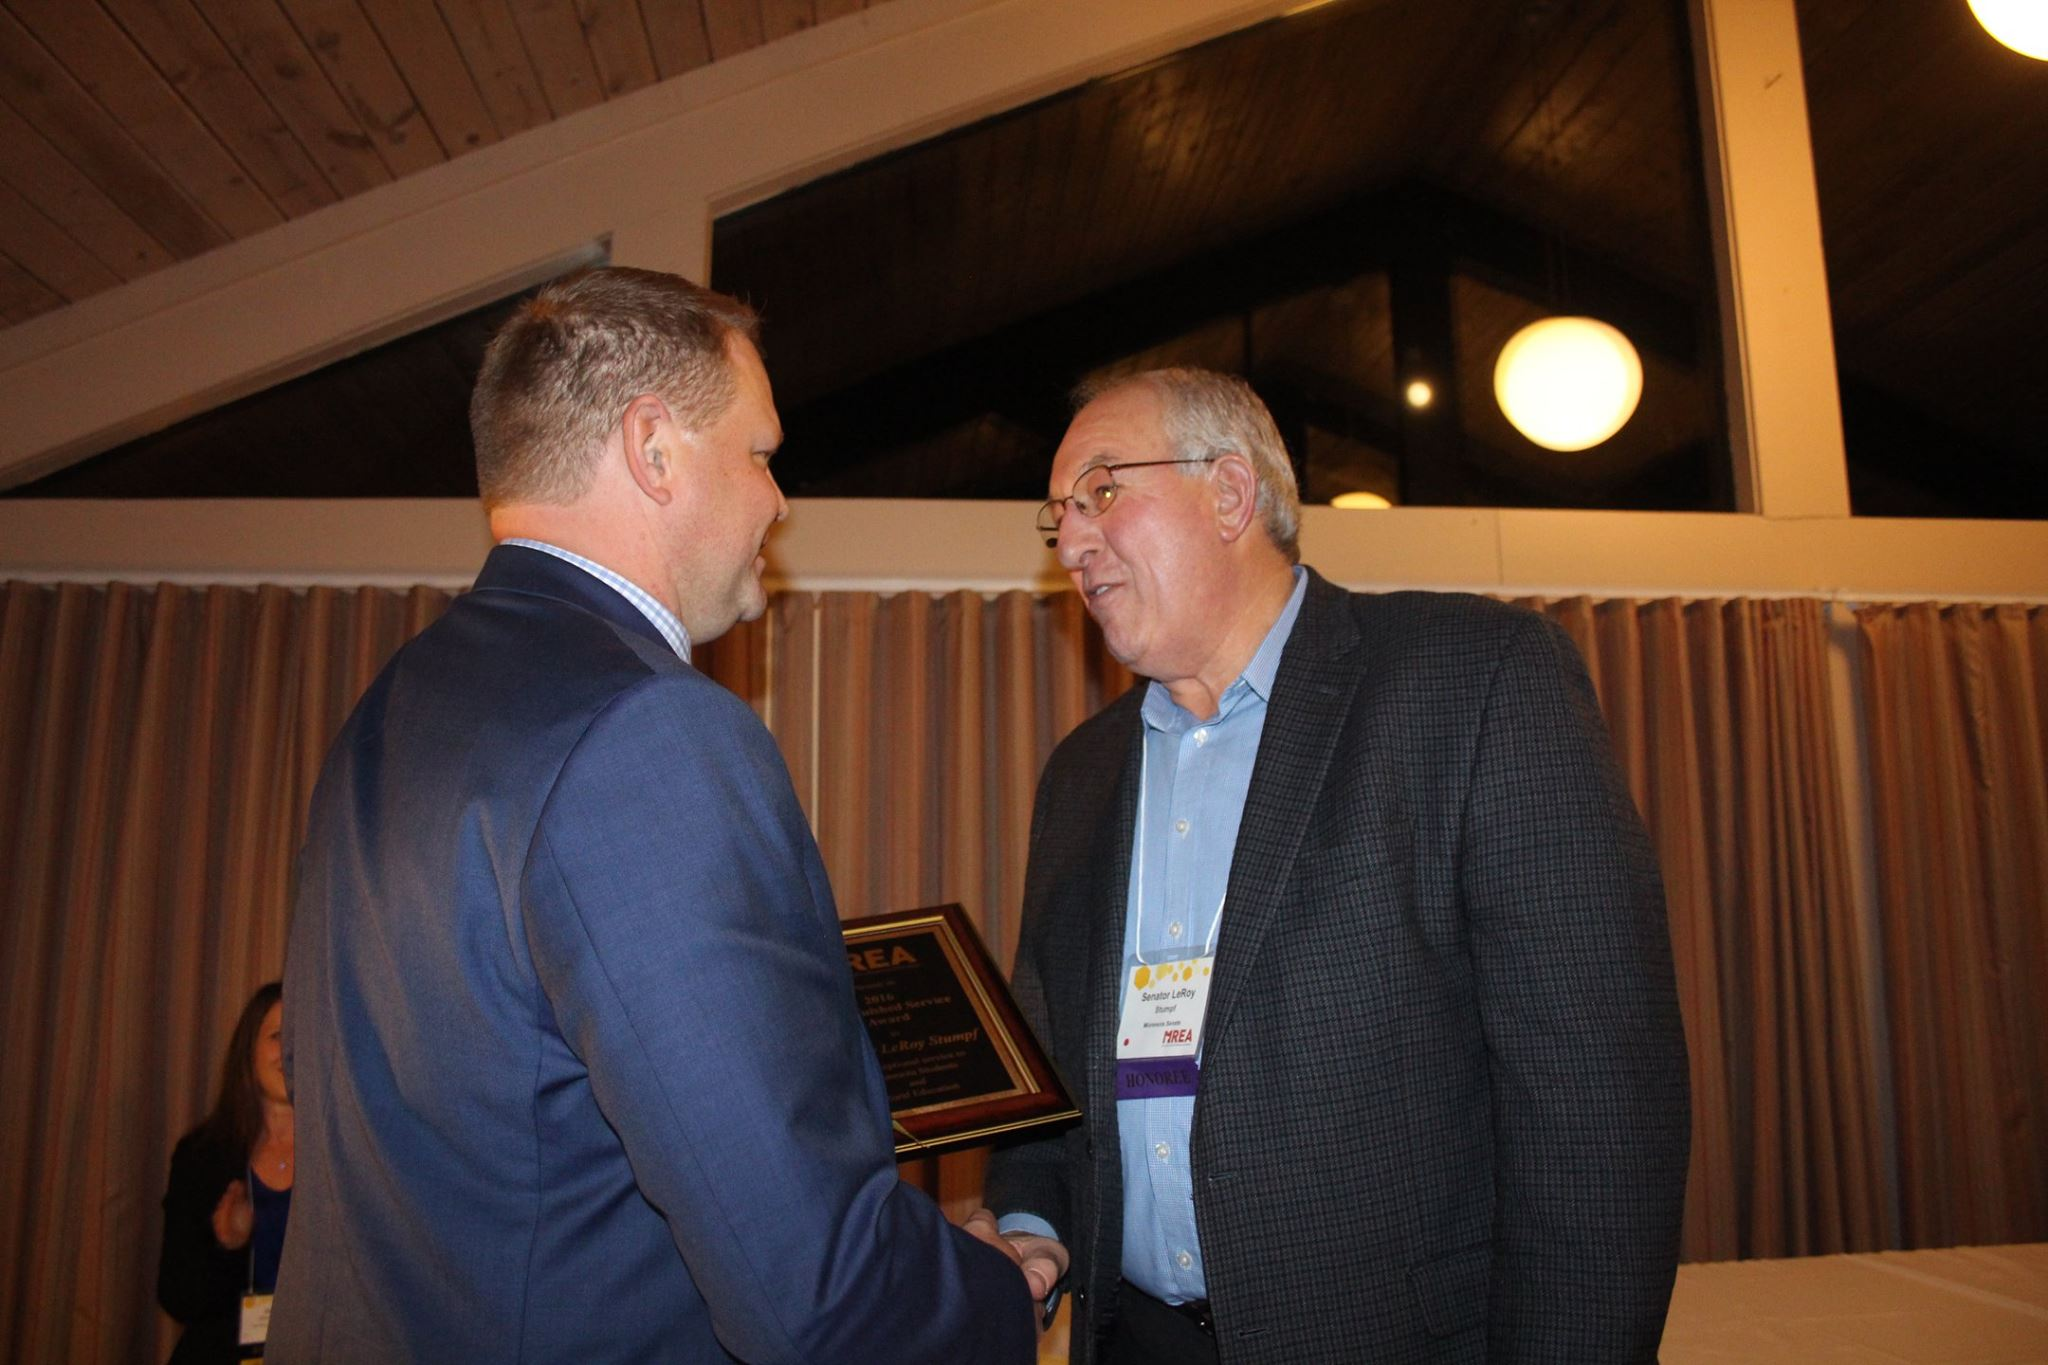 Stumpf Receives MREA's Distinguished Service Award